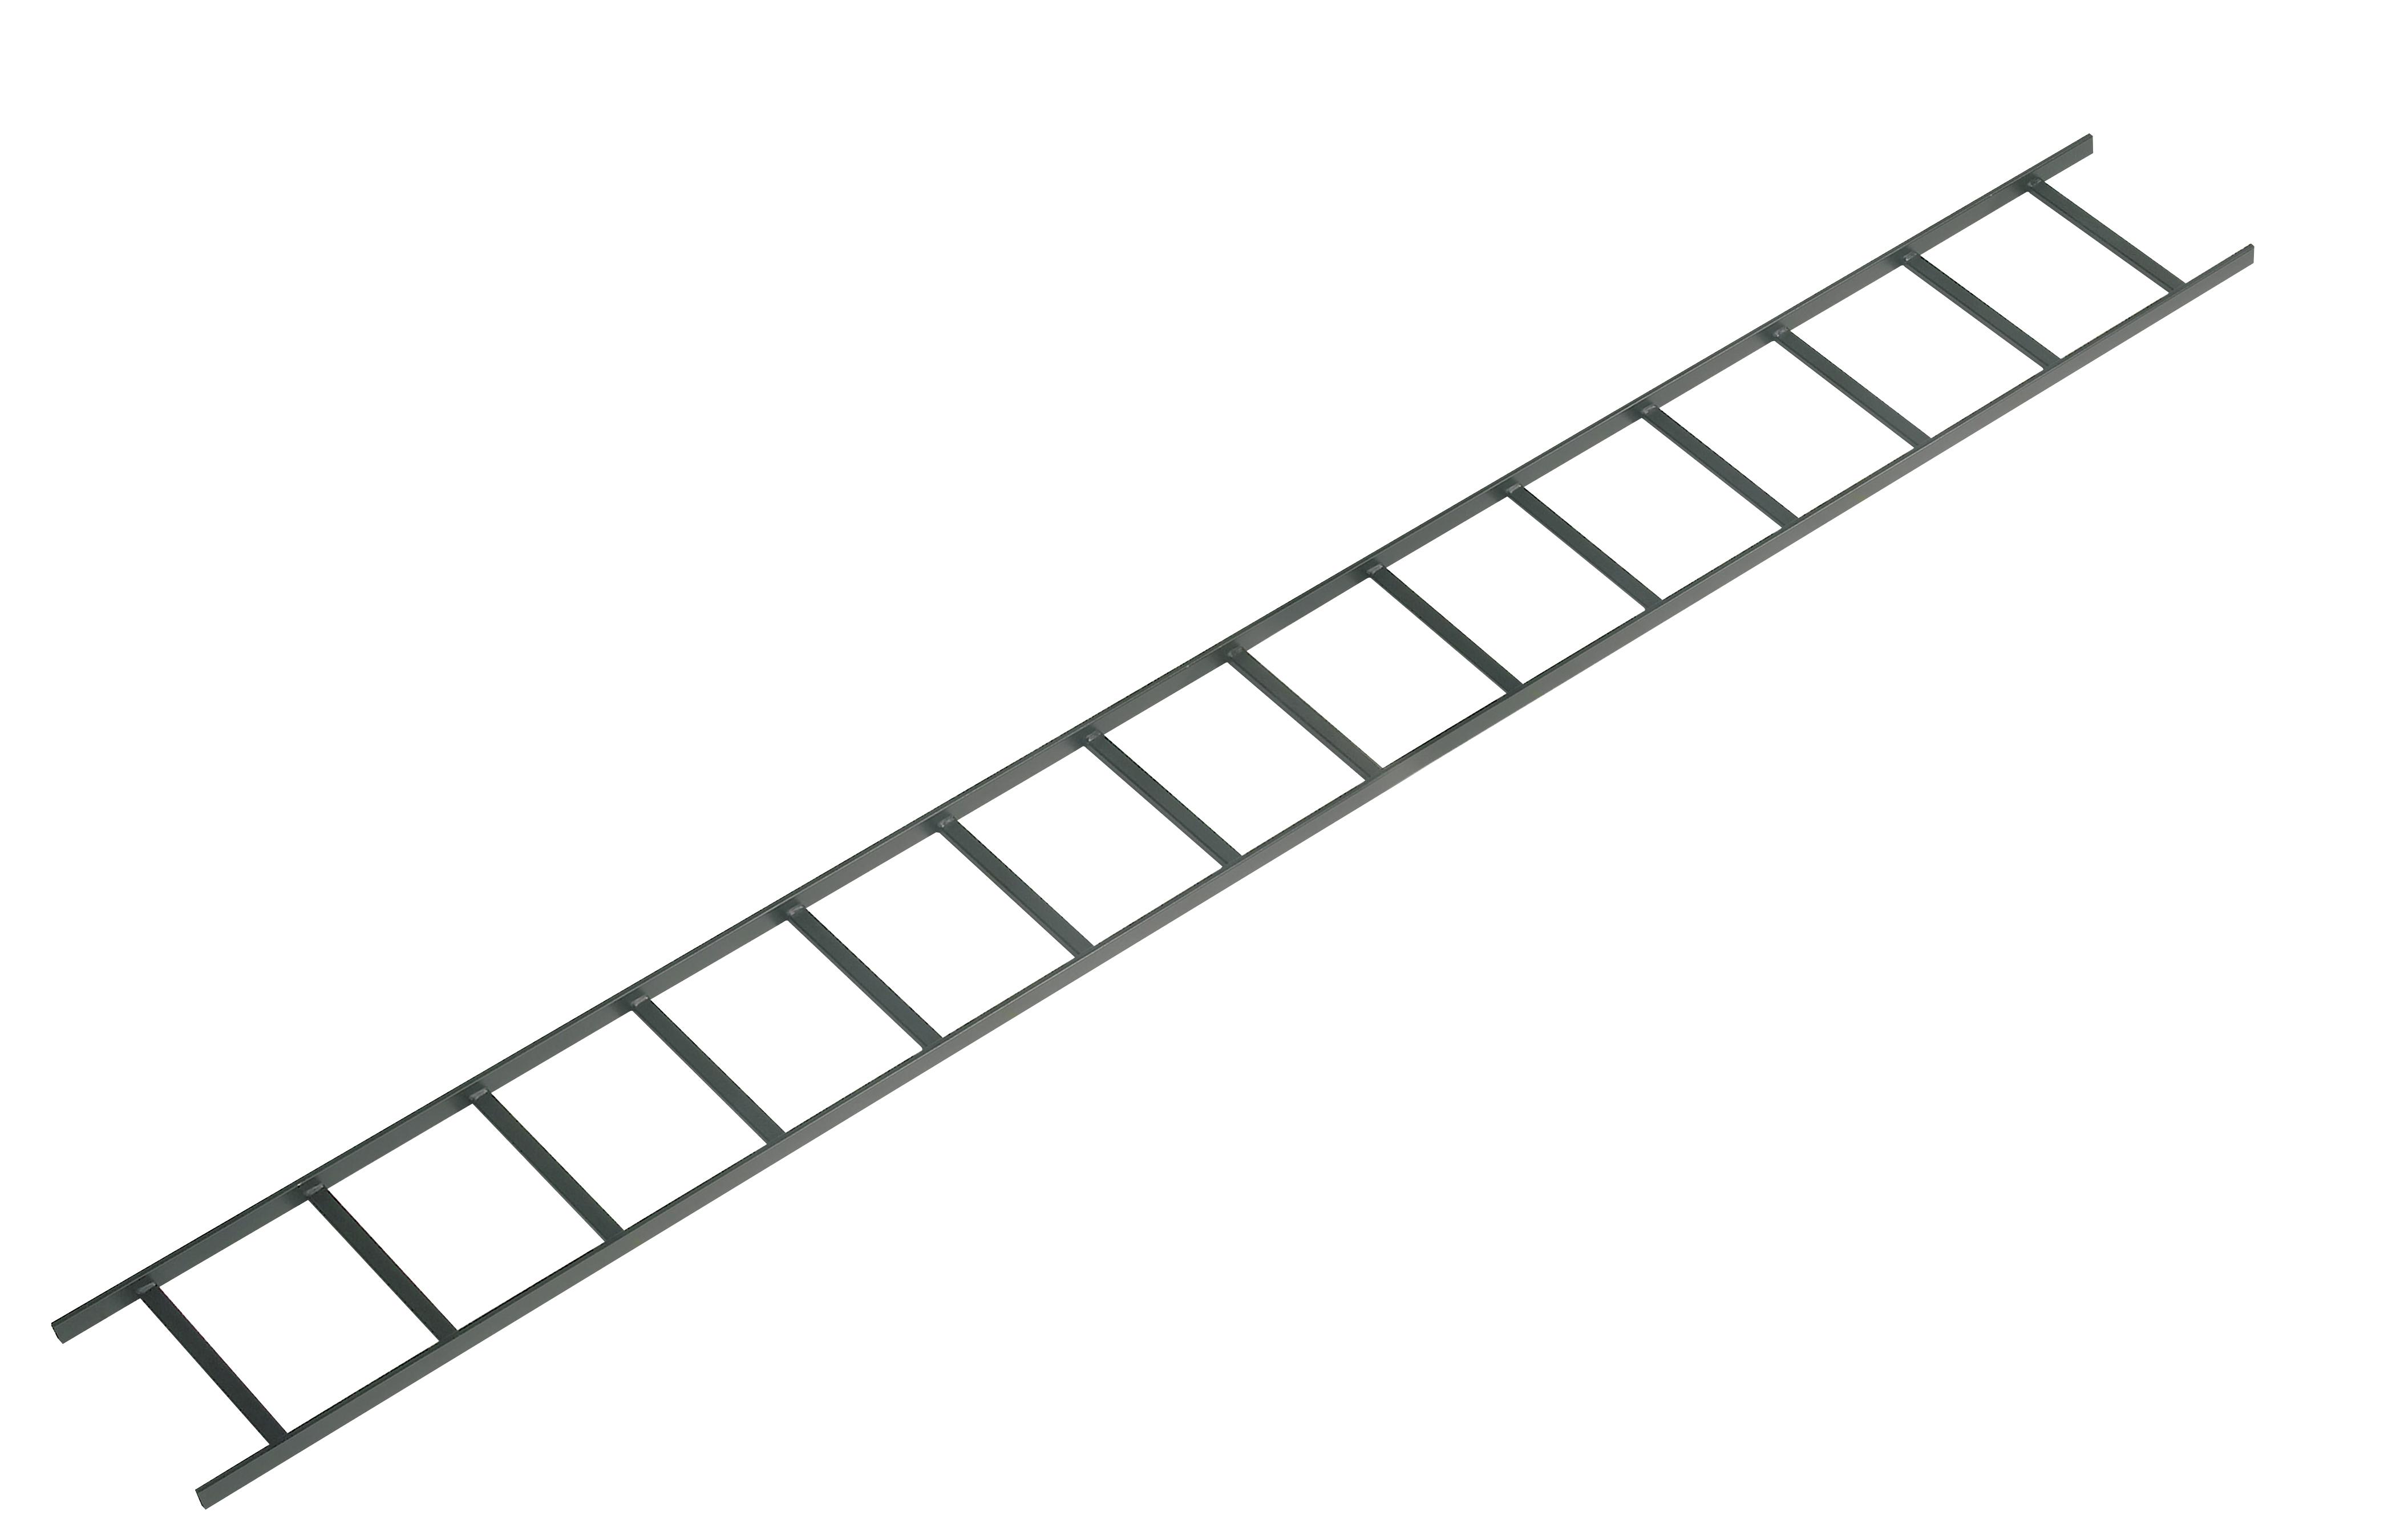 ladder rack 10 u0026 39 x12 u0026 39  bk 3pack